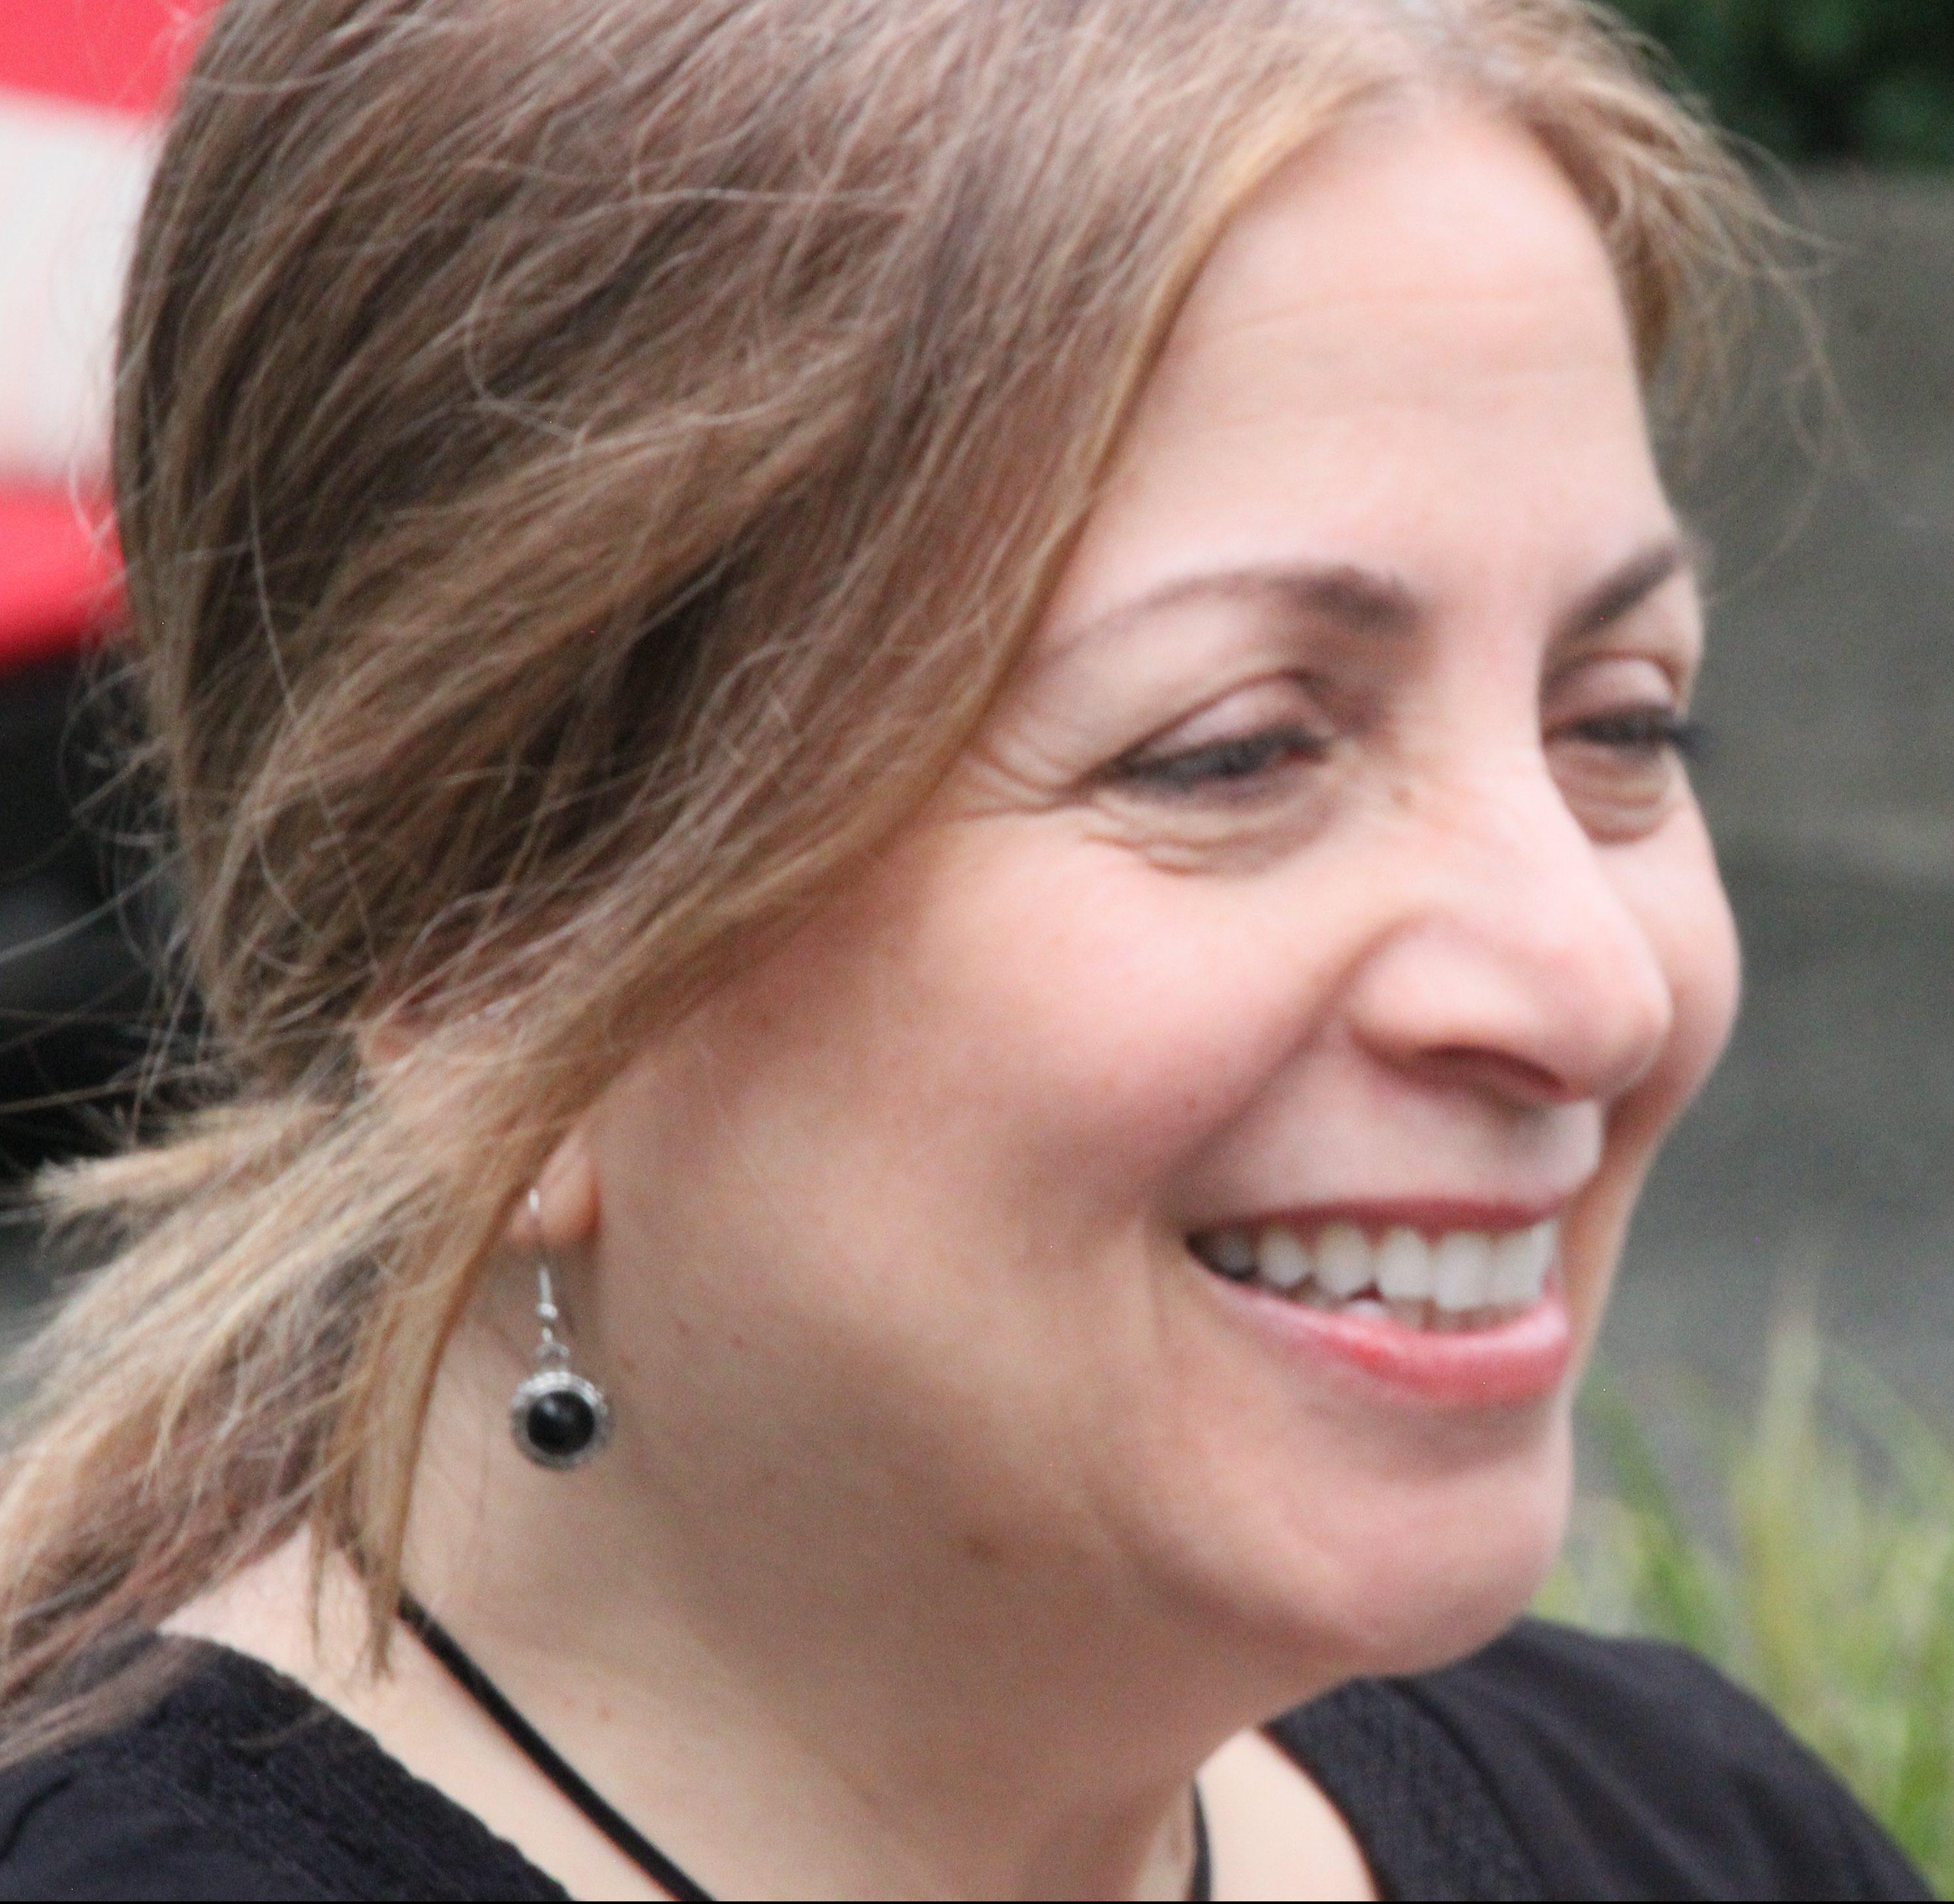 Dr. Lori Marino on Blackfish in Captivity